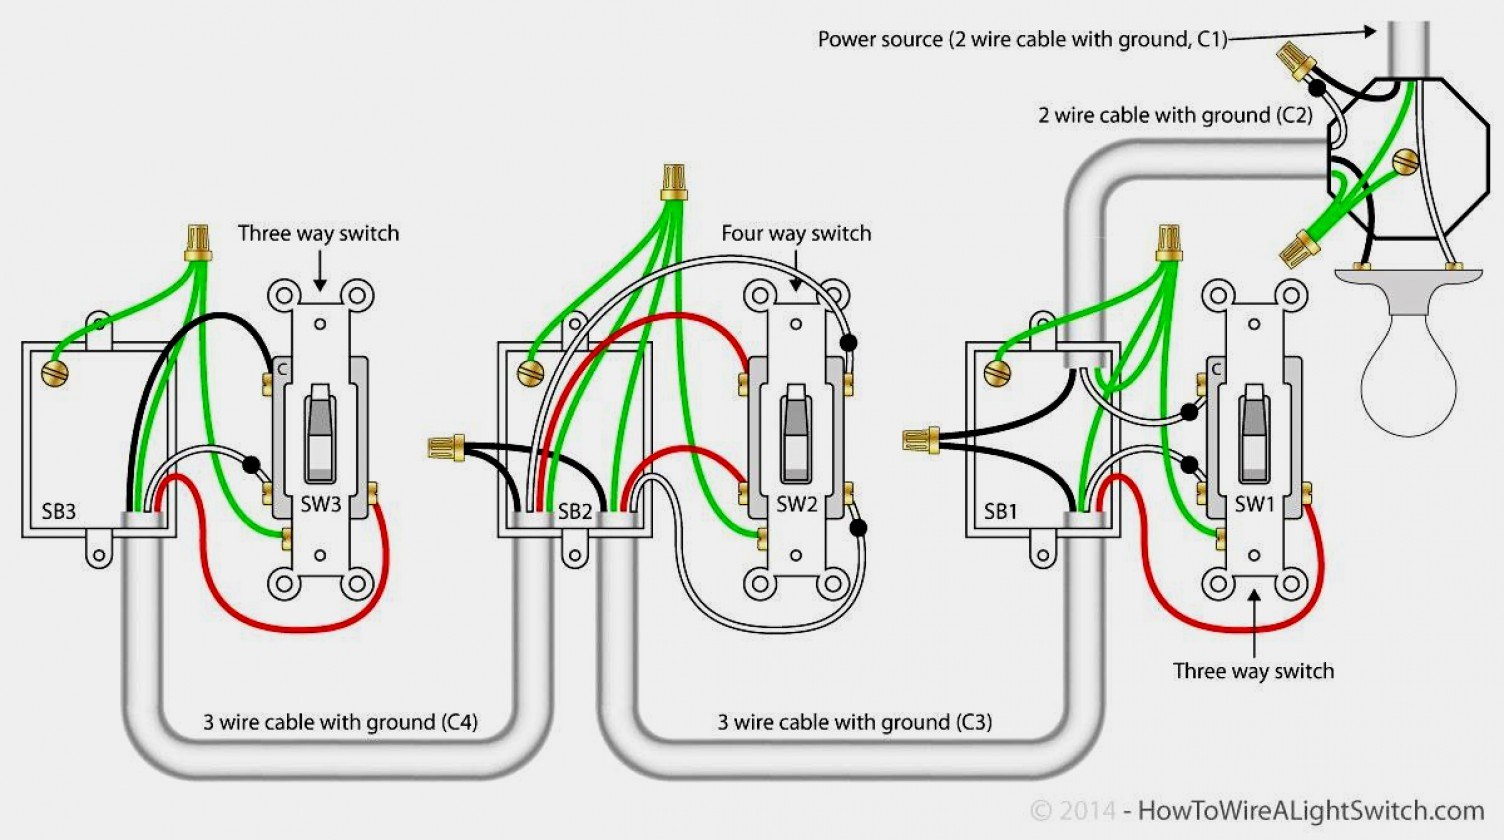 Lutron 4 Way Dimmer Wiring Diagram | Manual E-Books - 4 Way Wiring Diagram